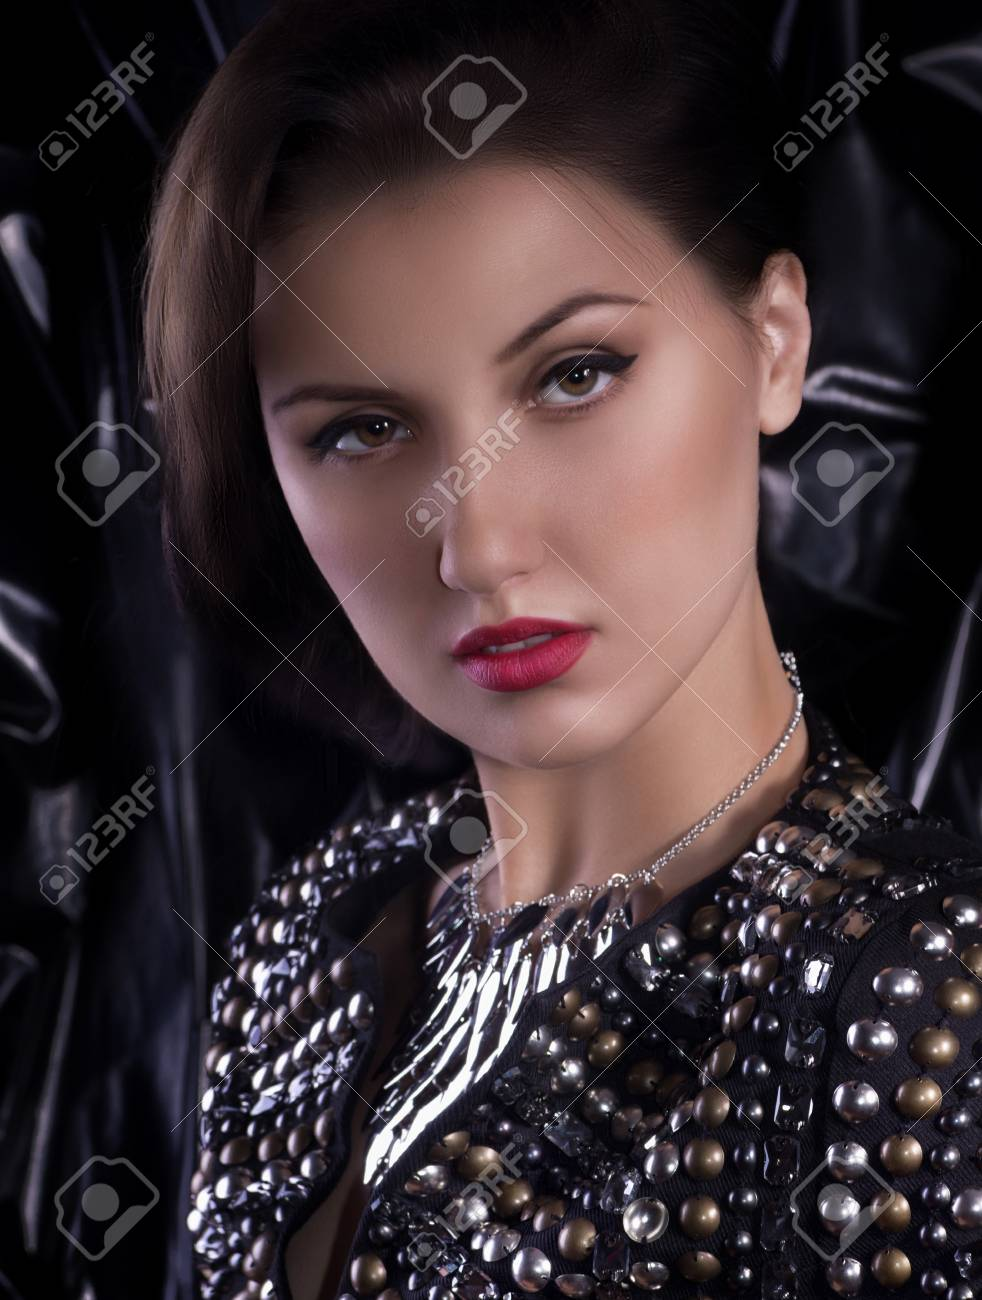 Fashion woman with jewelry precious decorations Stock Photo - 30548607